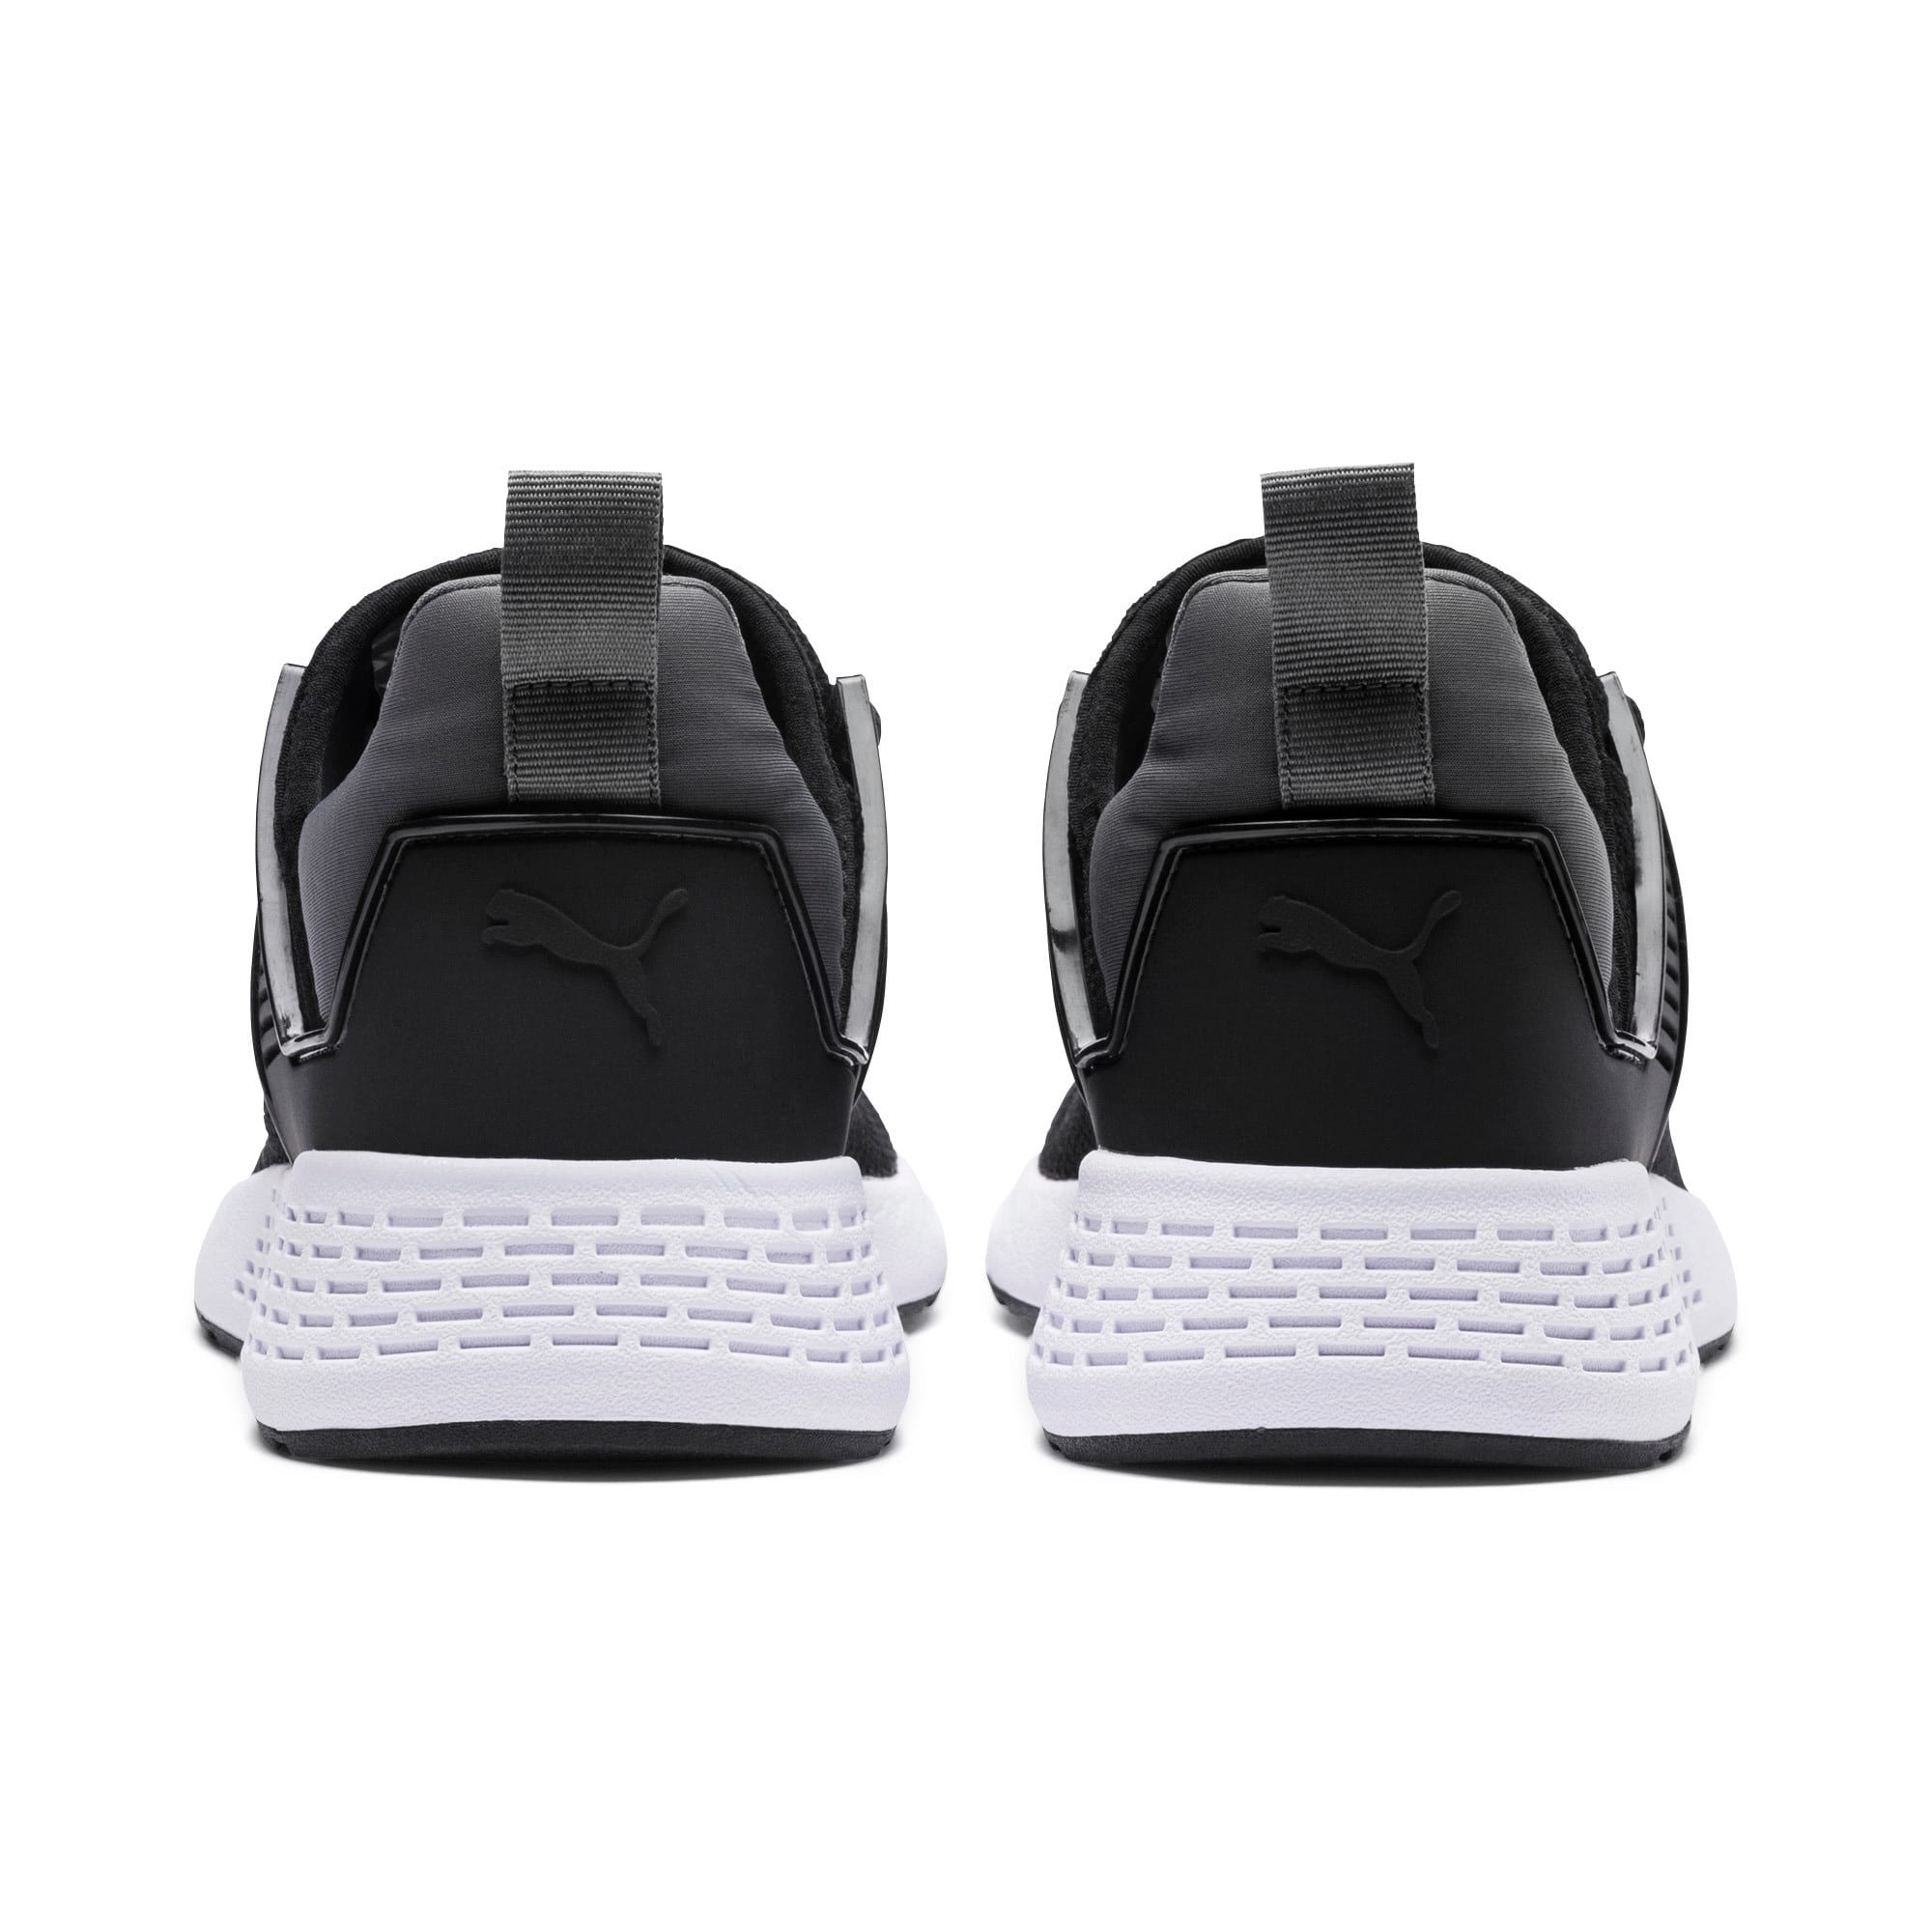 Thumbnail 4 of Insurge Mesh  Sneakers, Black-Iron Gate-White, medium